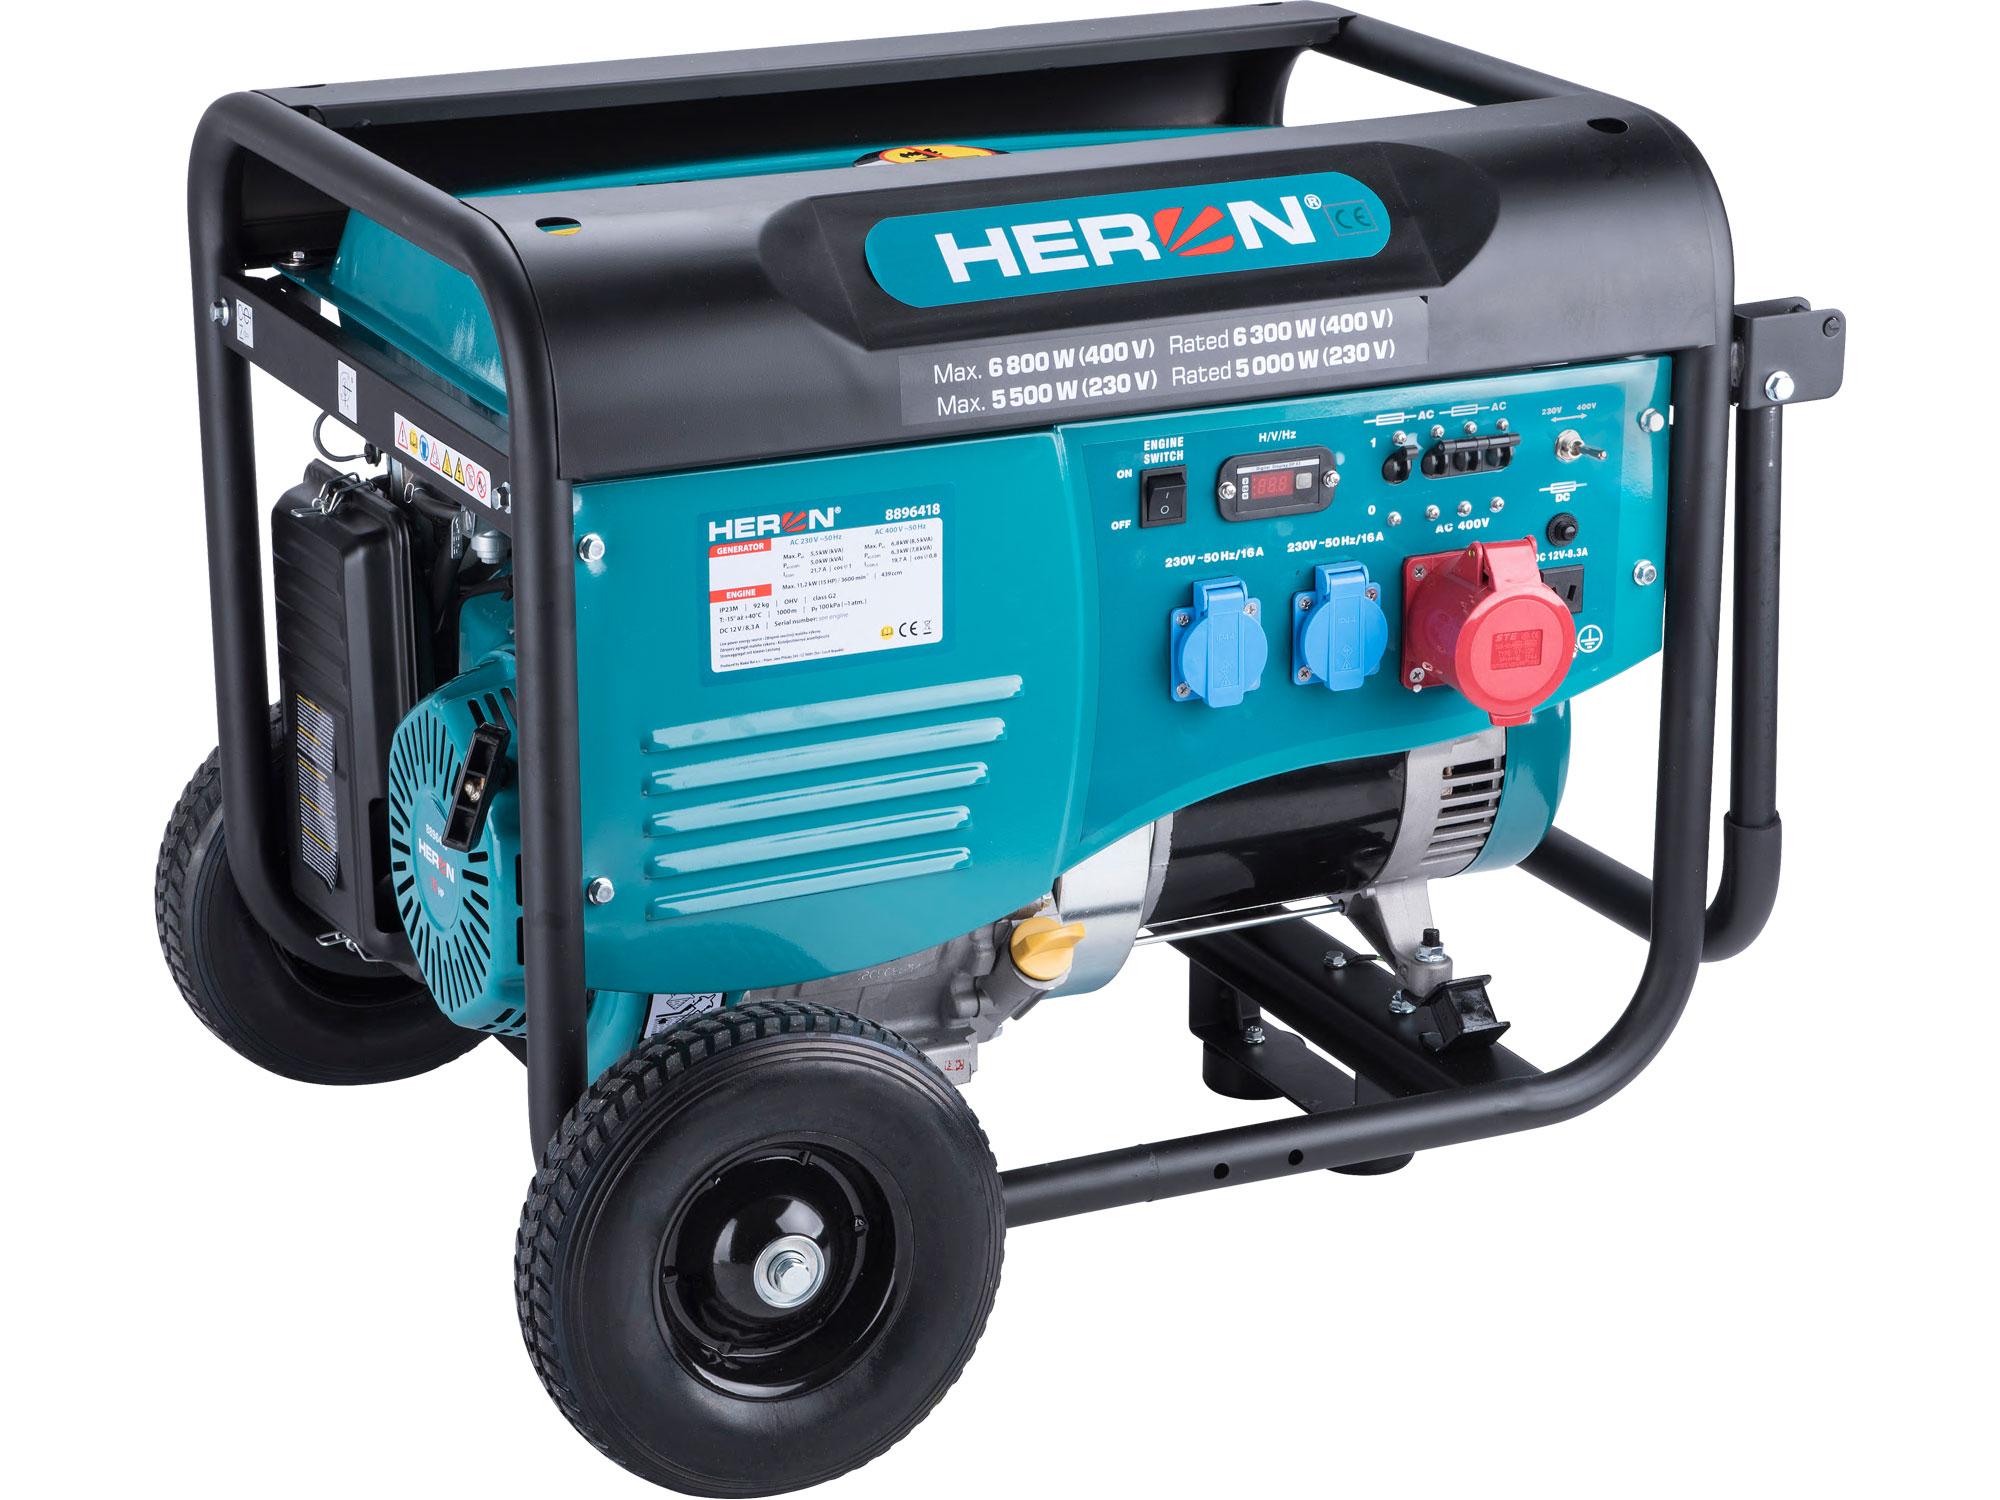 elektrocentrála benzínová 15HP/6,8kW/8,5kVA (400V), 5,5kW (230V), podvozek